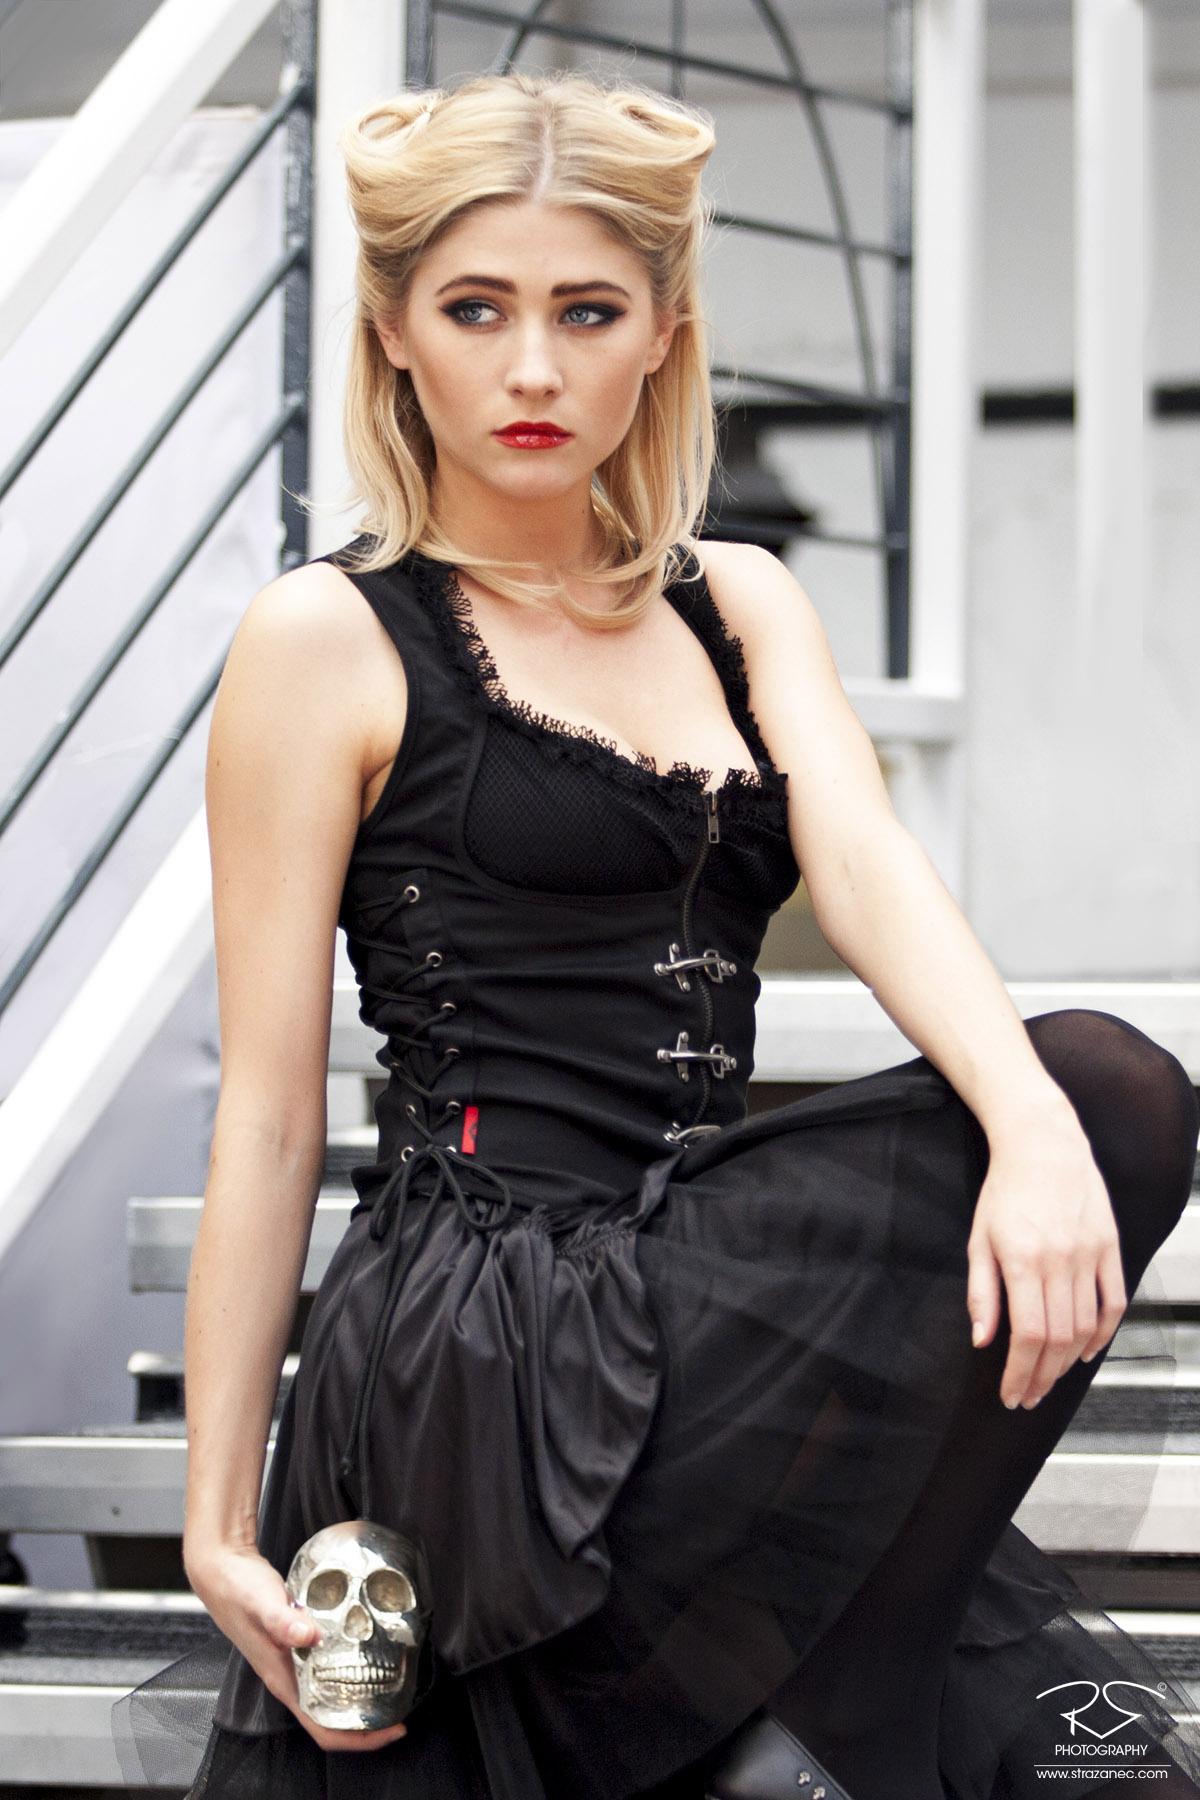 strazanec photography - london edge 2014 blonde girl with skull 02